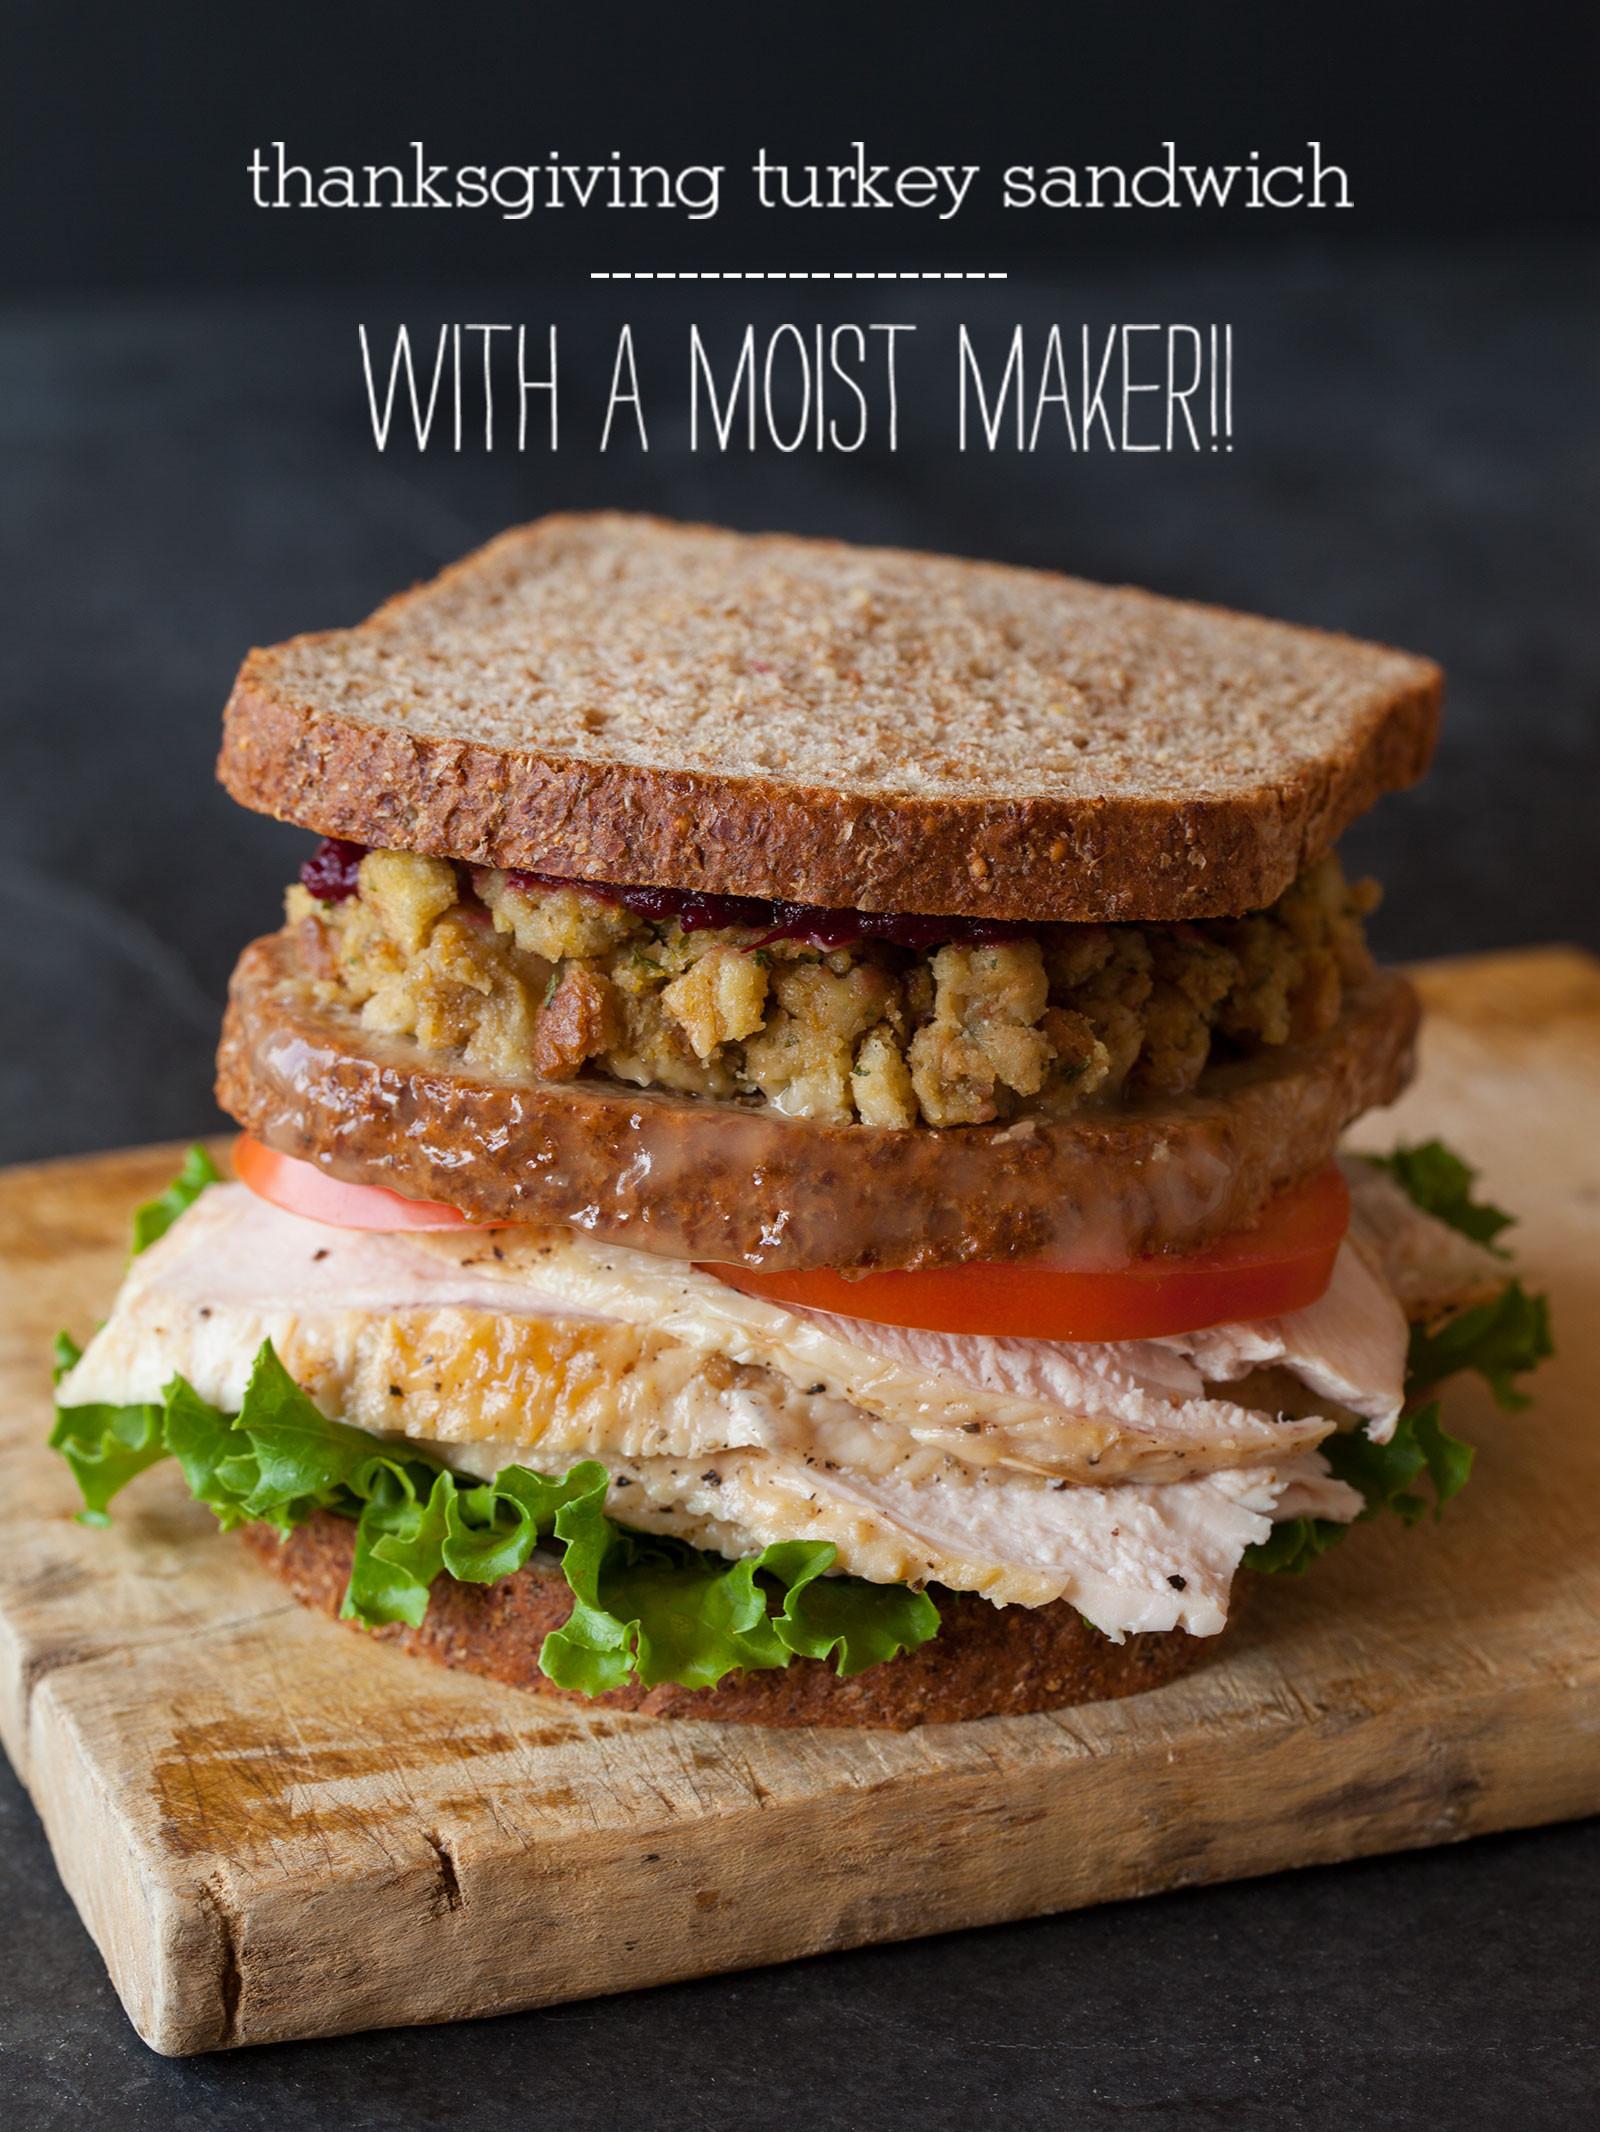 Thanksgiving Turkey Sandwich  Thanksgiving Turkey Sandwich with a Moist Maker